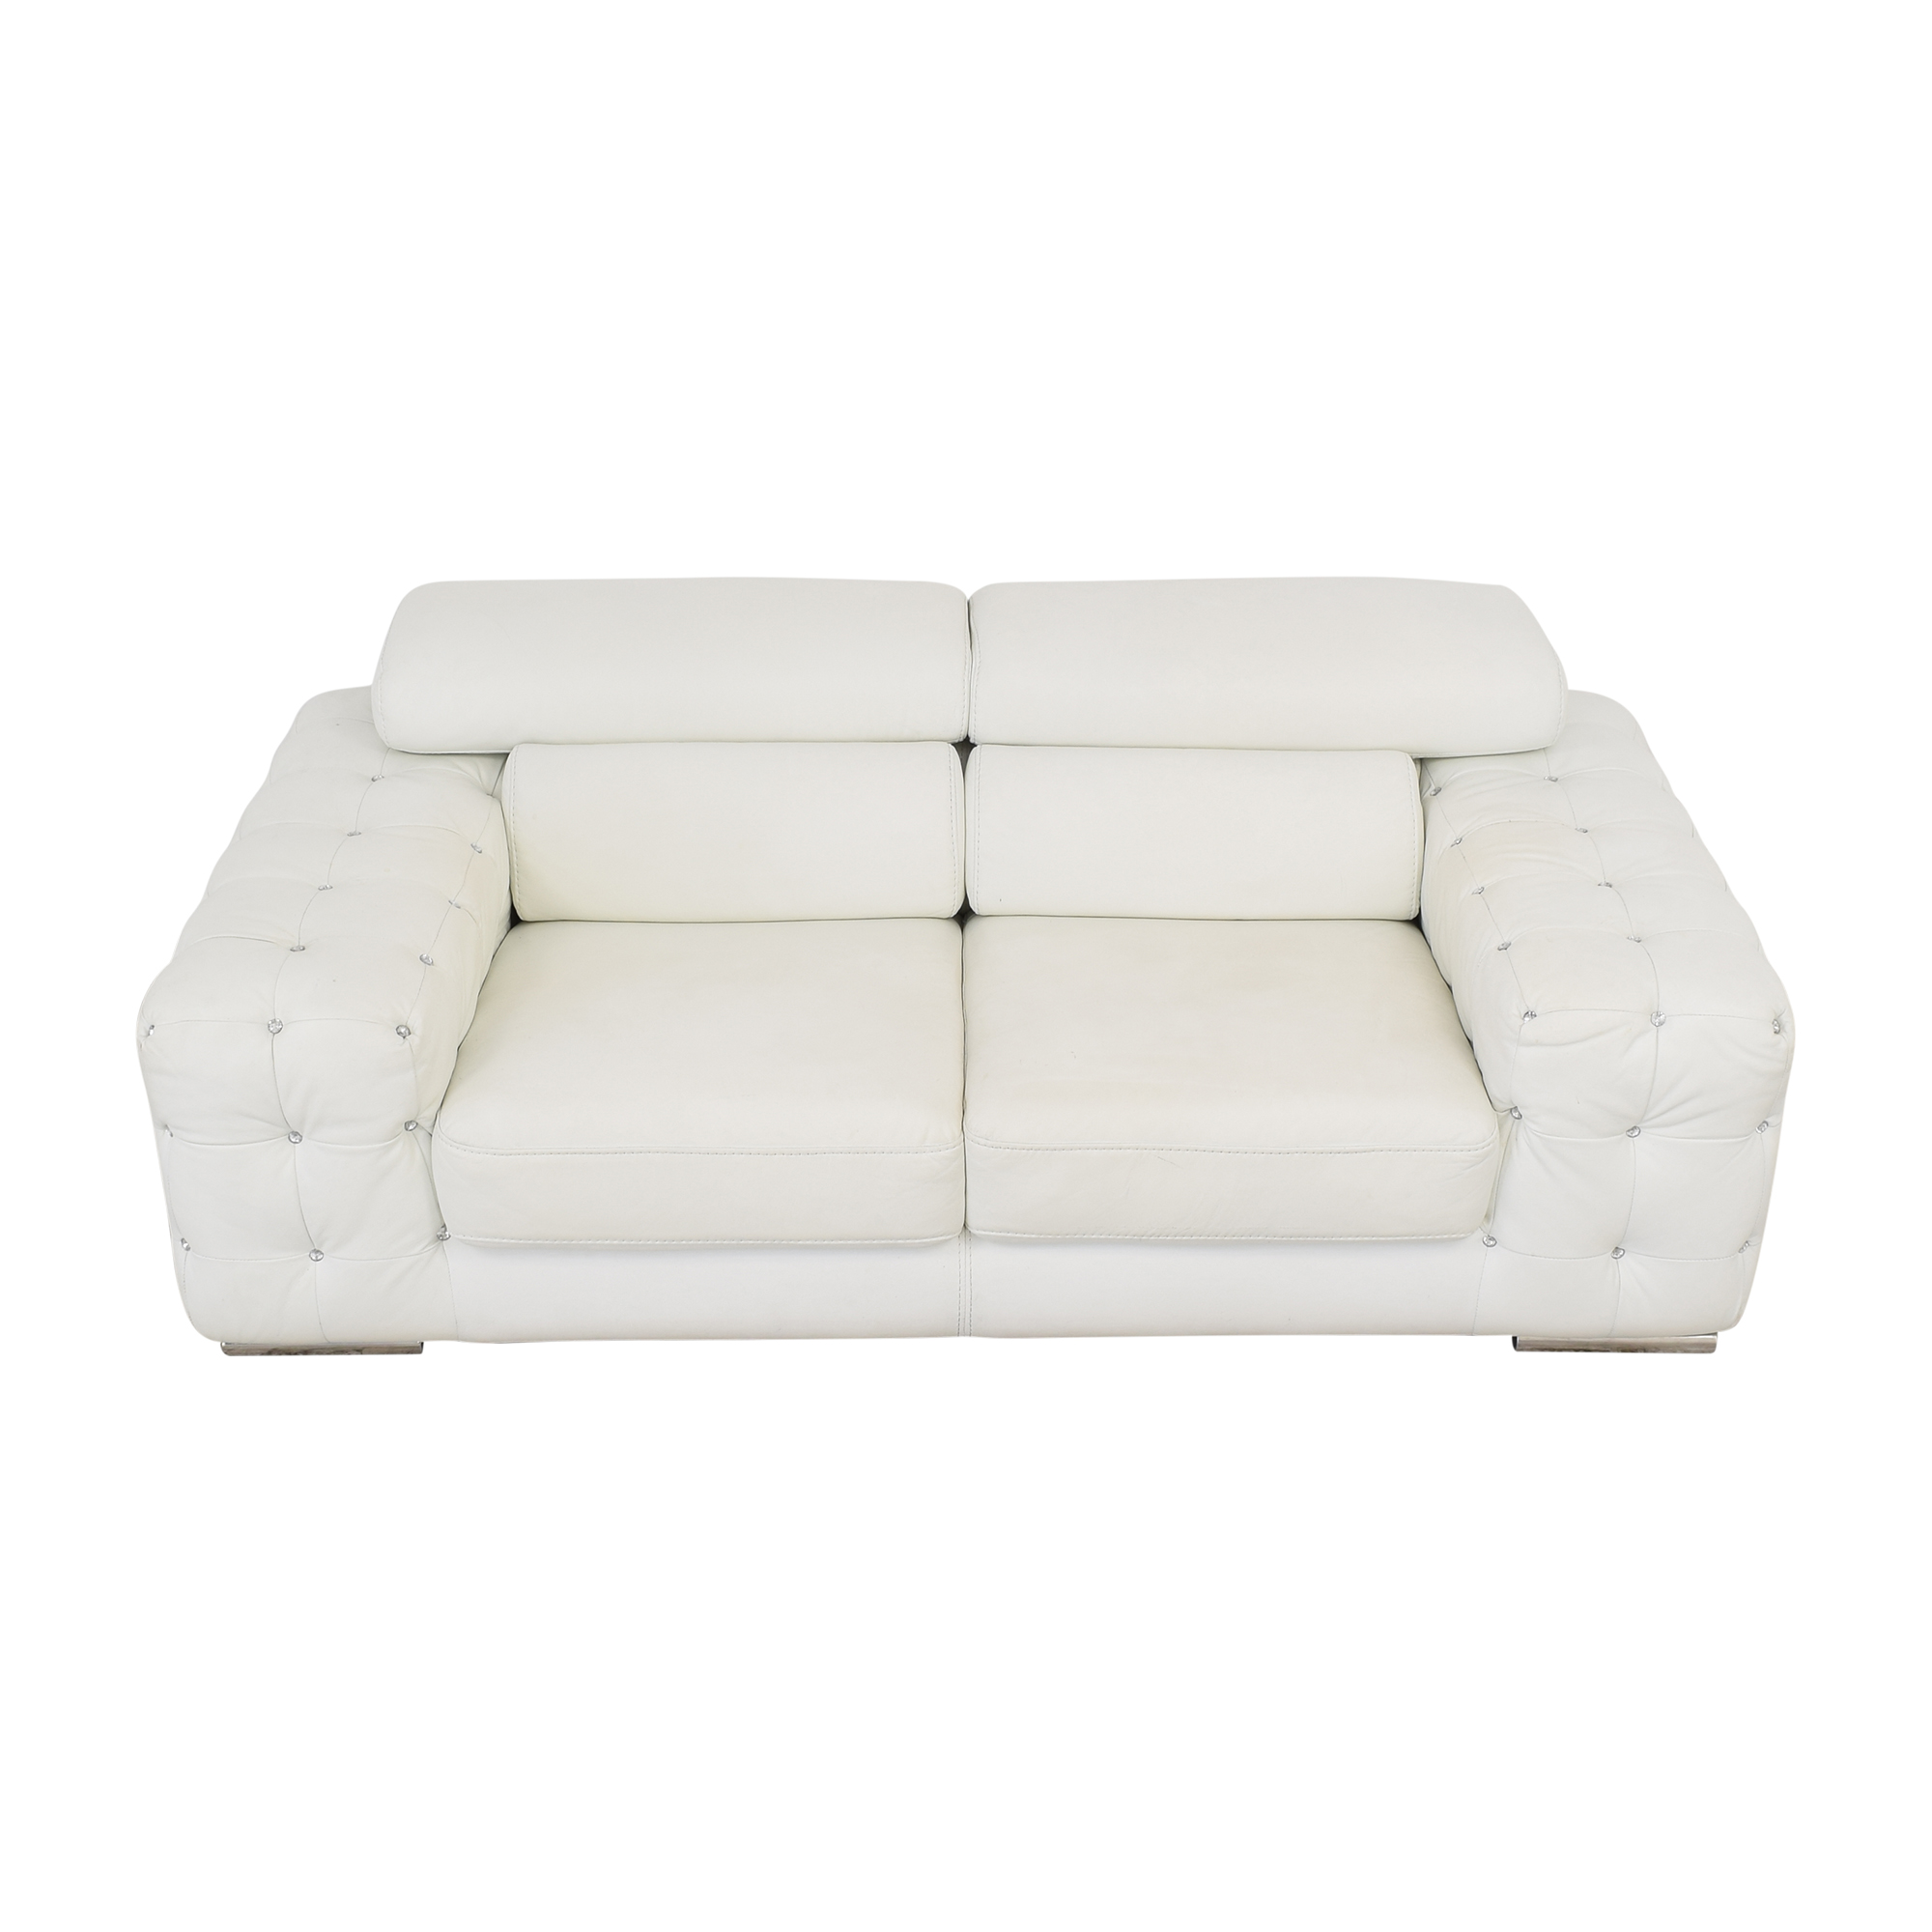 Vieri Divani Divani Casa Corinne Modern Sofa for sale